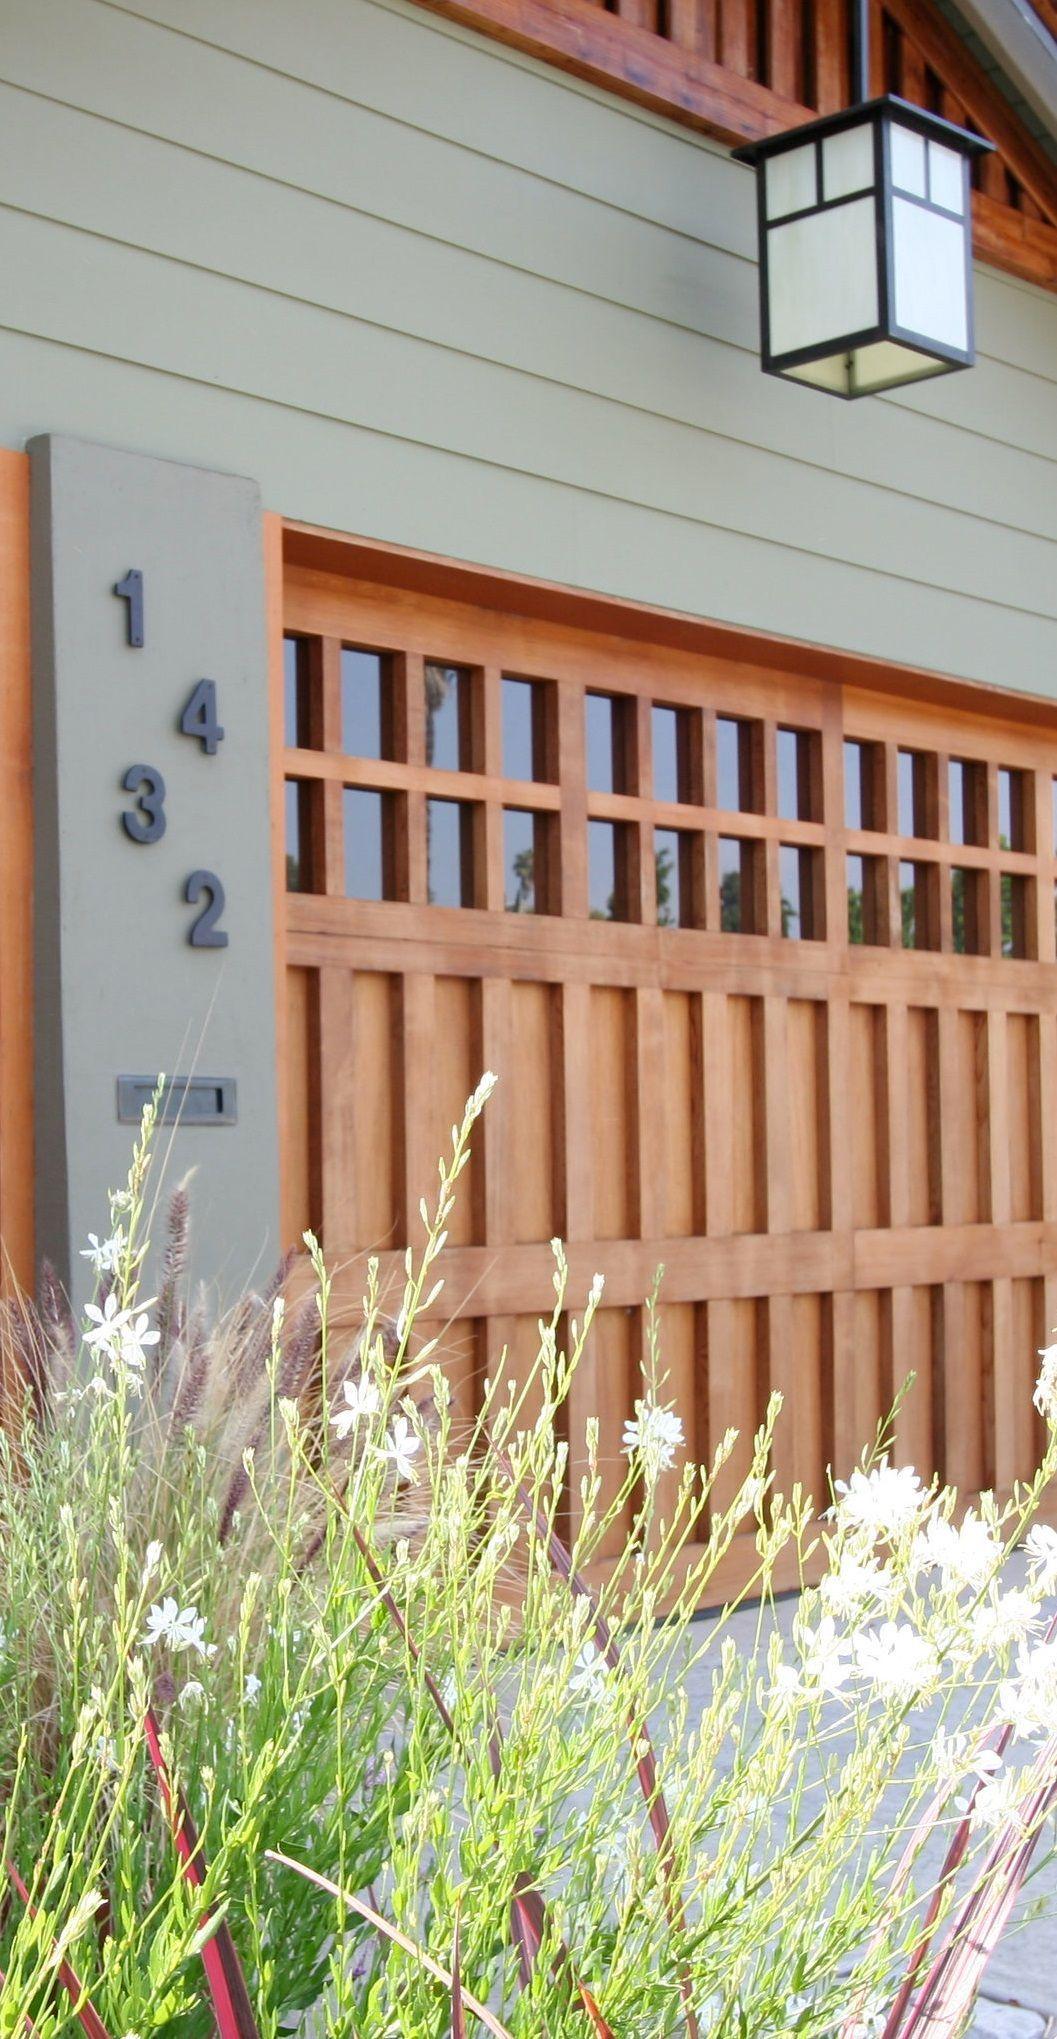 Choosing the Right Garage Door Paint for Your Home in 2020 ... on Choosing Garage Door Paint Colors  id=34615